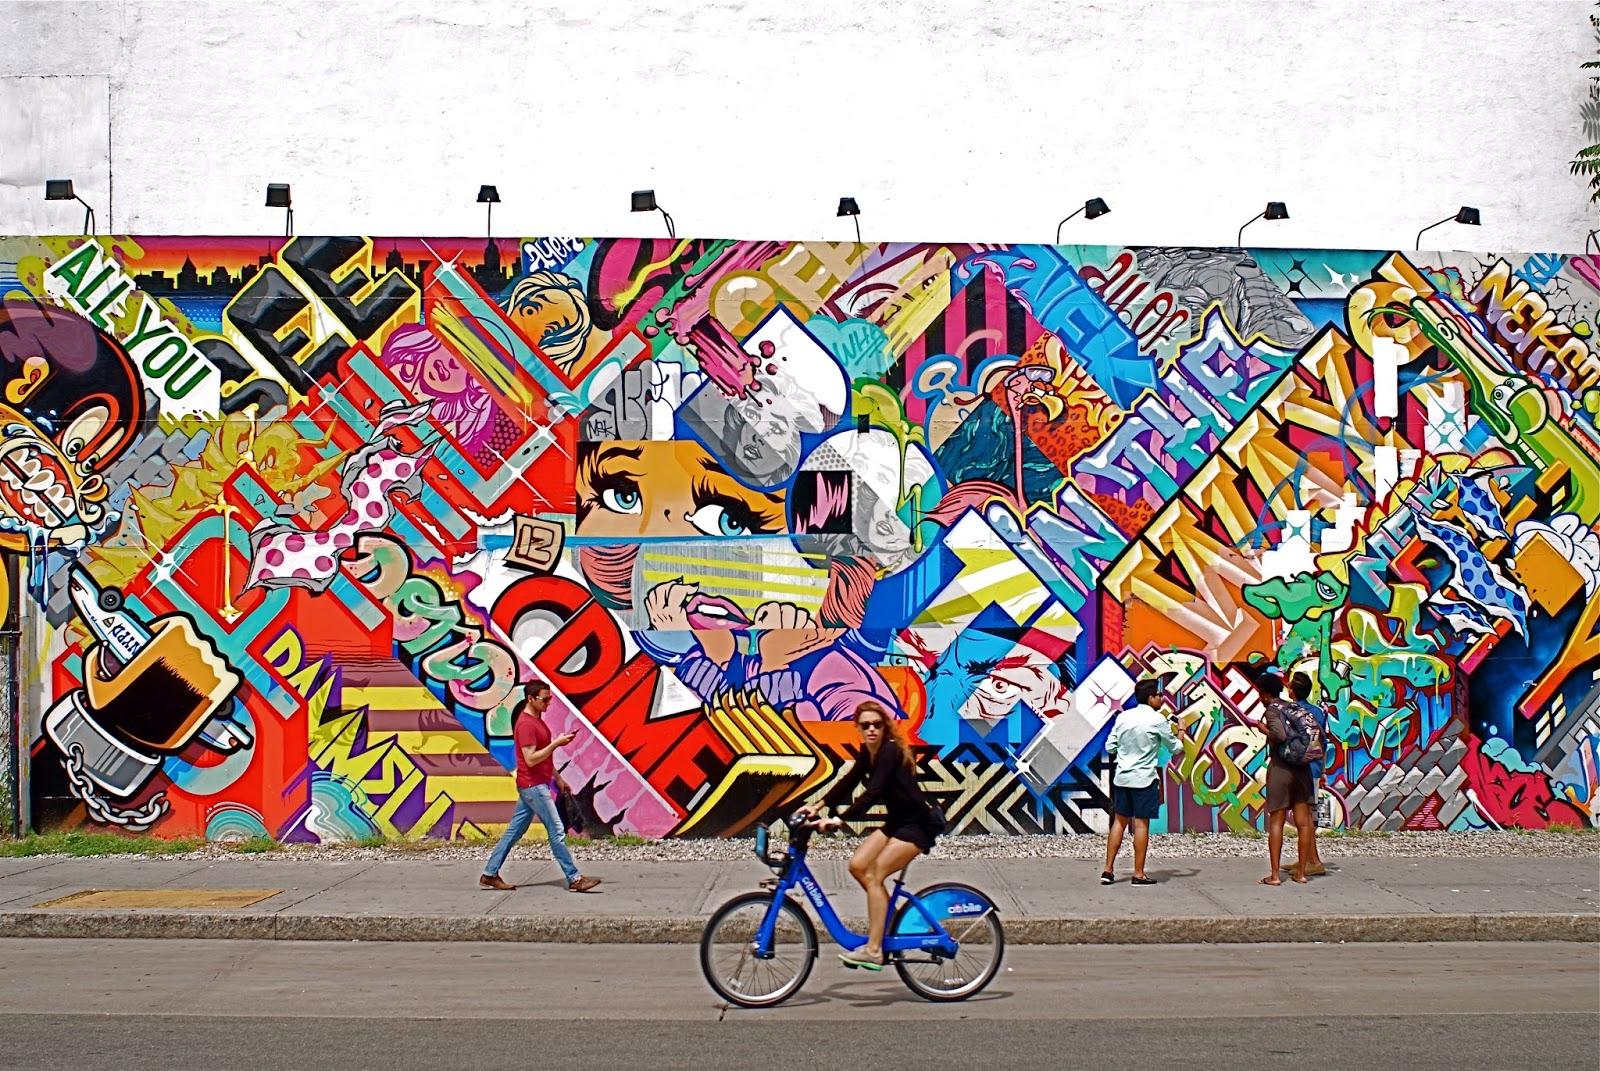 NYC ♥ NYC: Revok And Pose Mural At Bowery And Houston